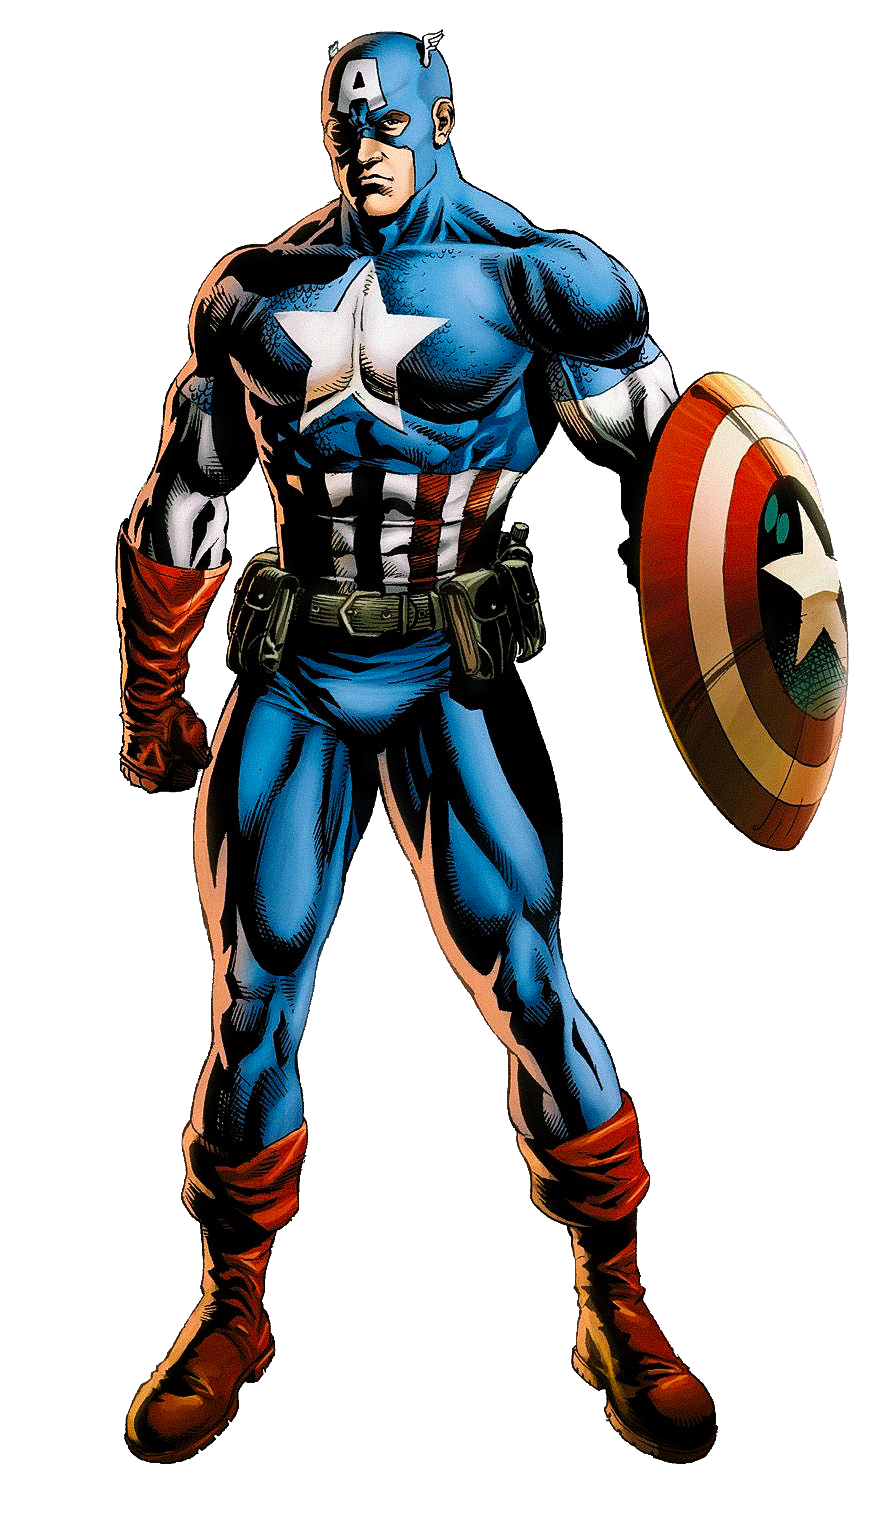 58bb4b052b4 Pin by Llnup on Captain America